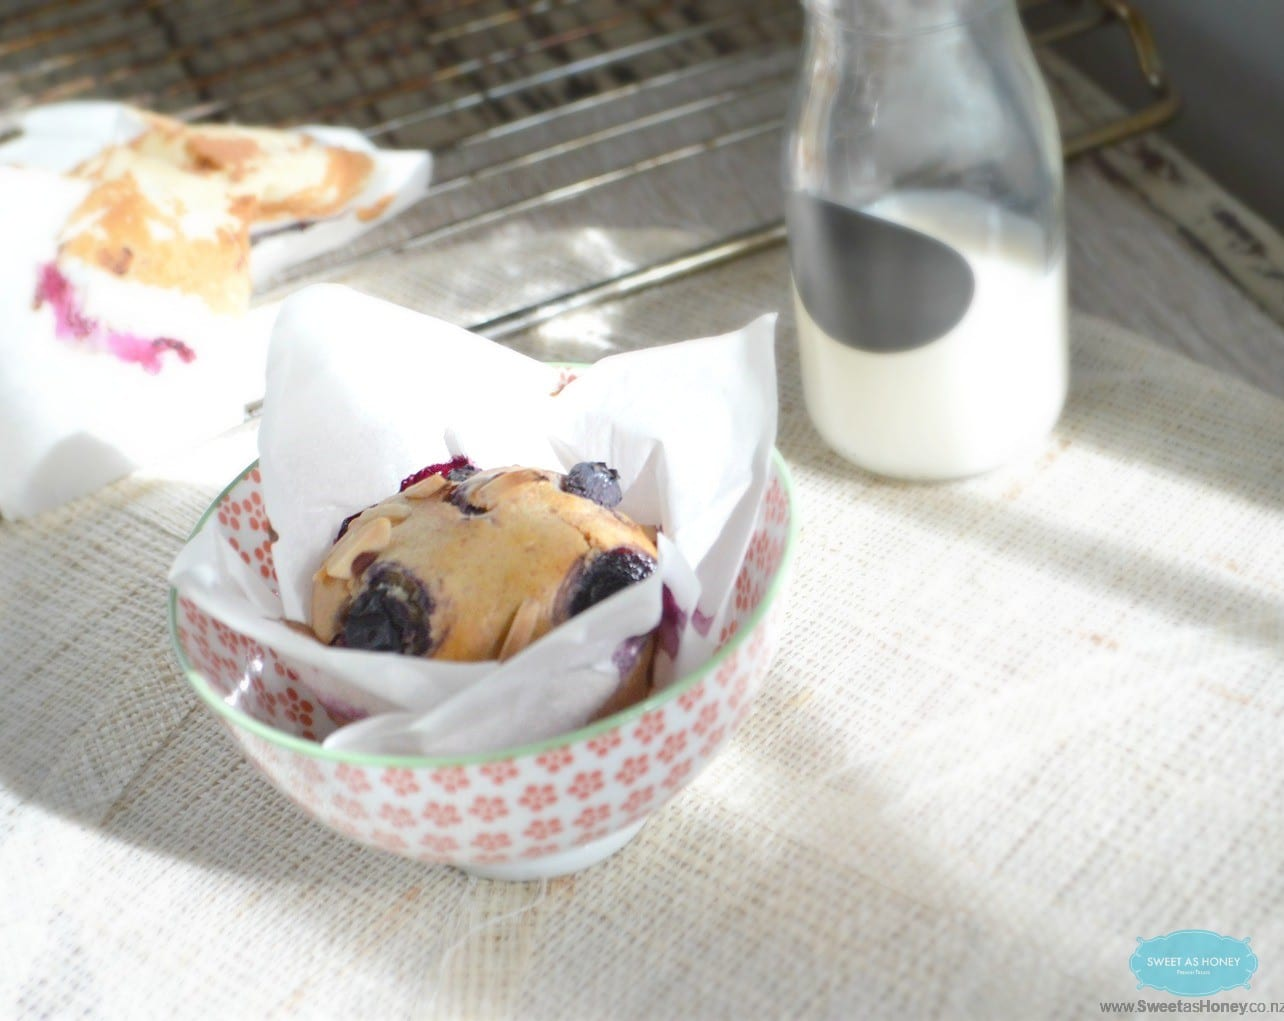 Blueberry & Almond Muffins